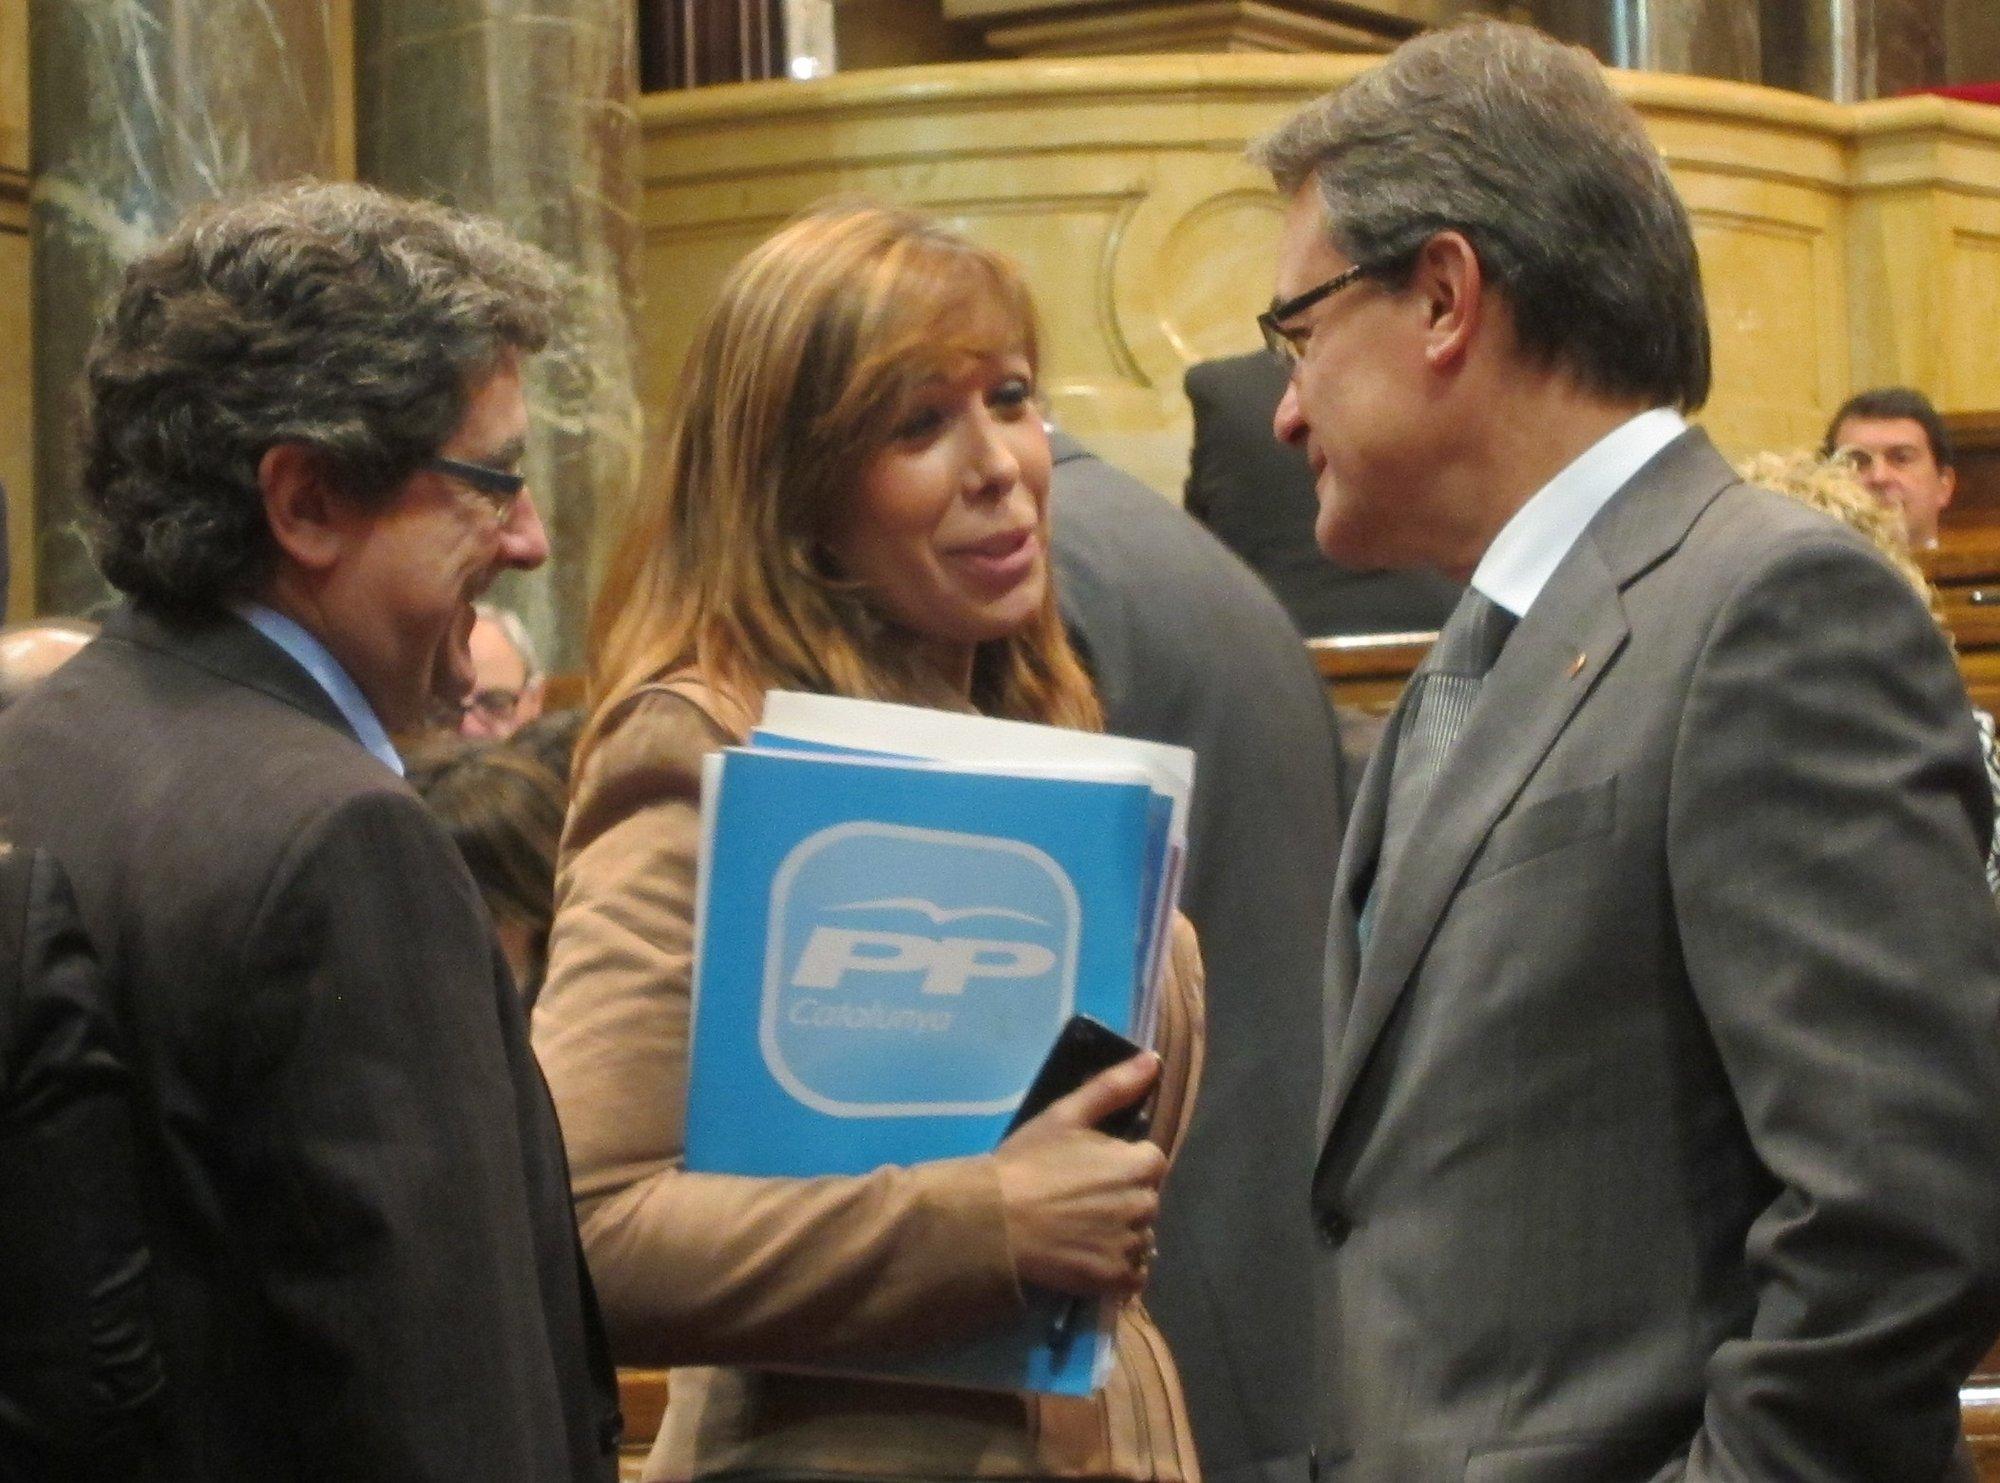 Camacho exigirá este jueves a Mas realismo ante sus ansias de pacto fiscal